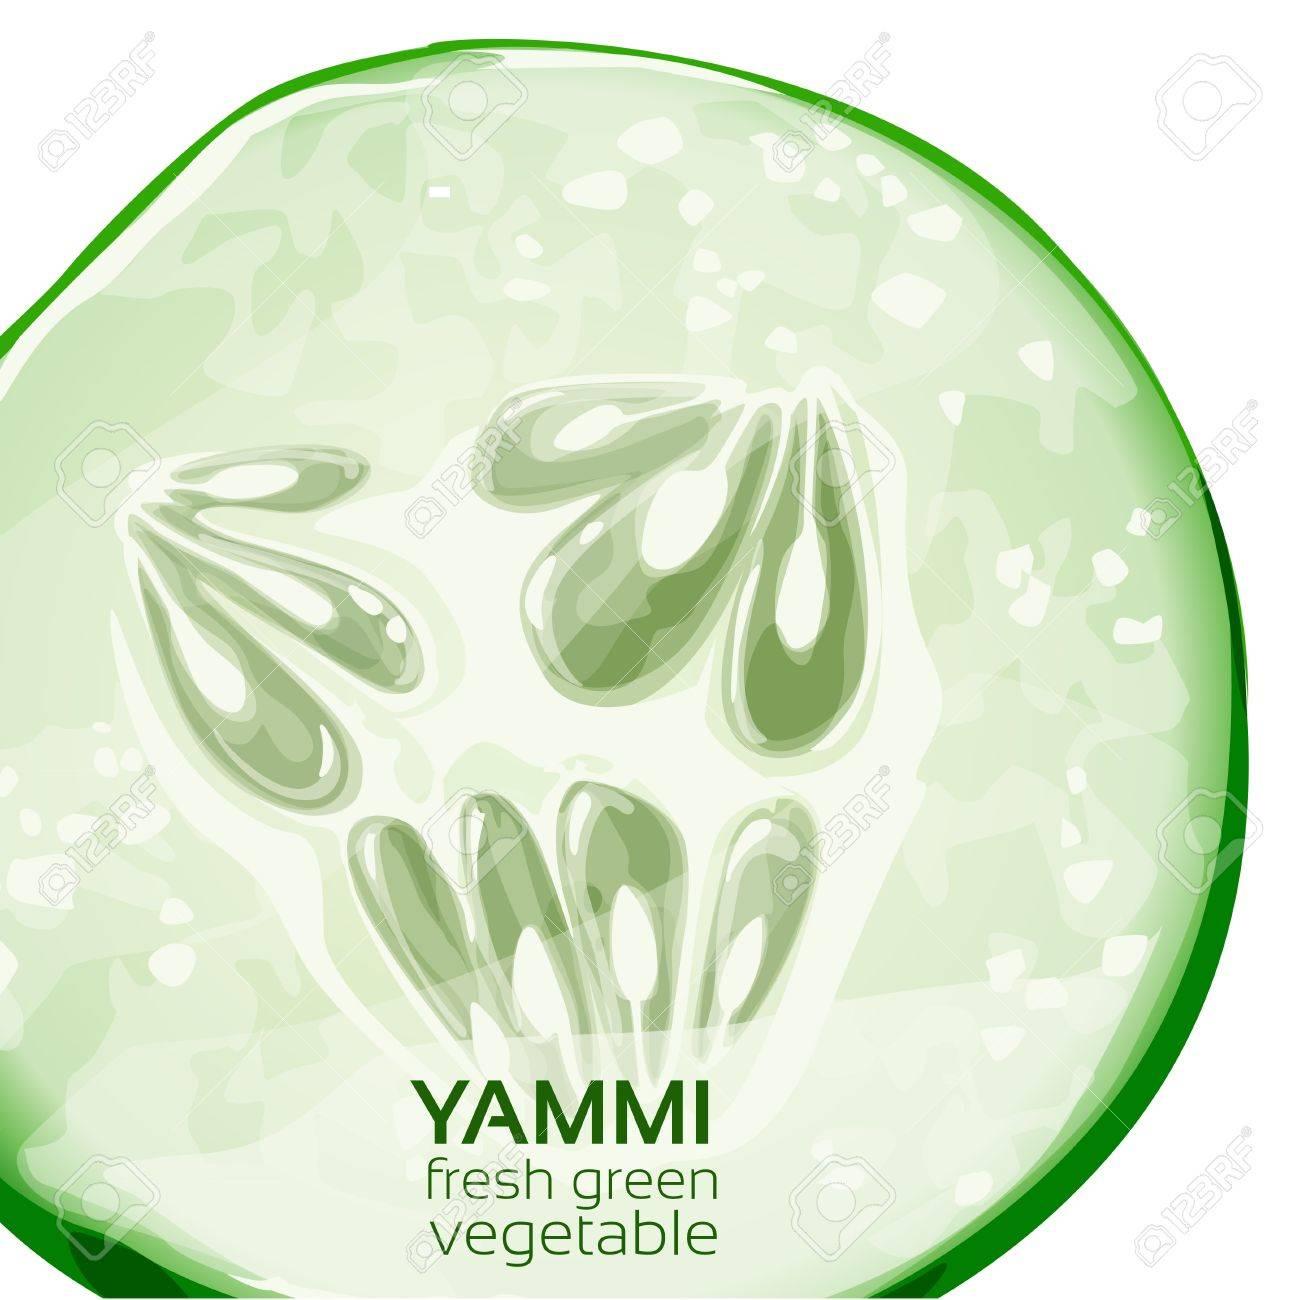 Yammi fresh green vegetable poster Stock Vector - 18011076